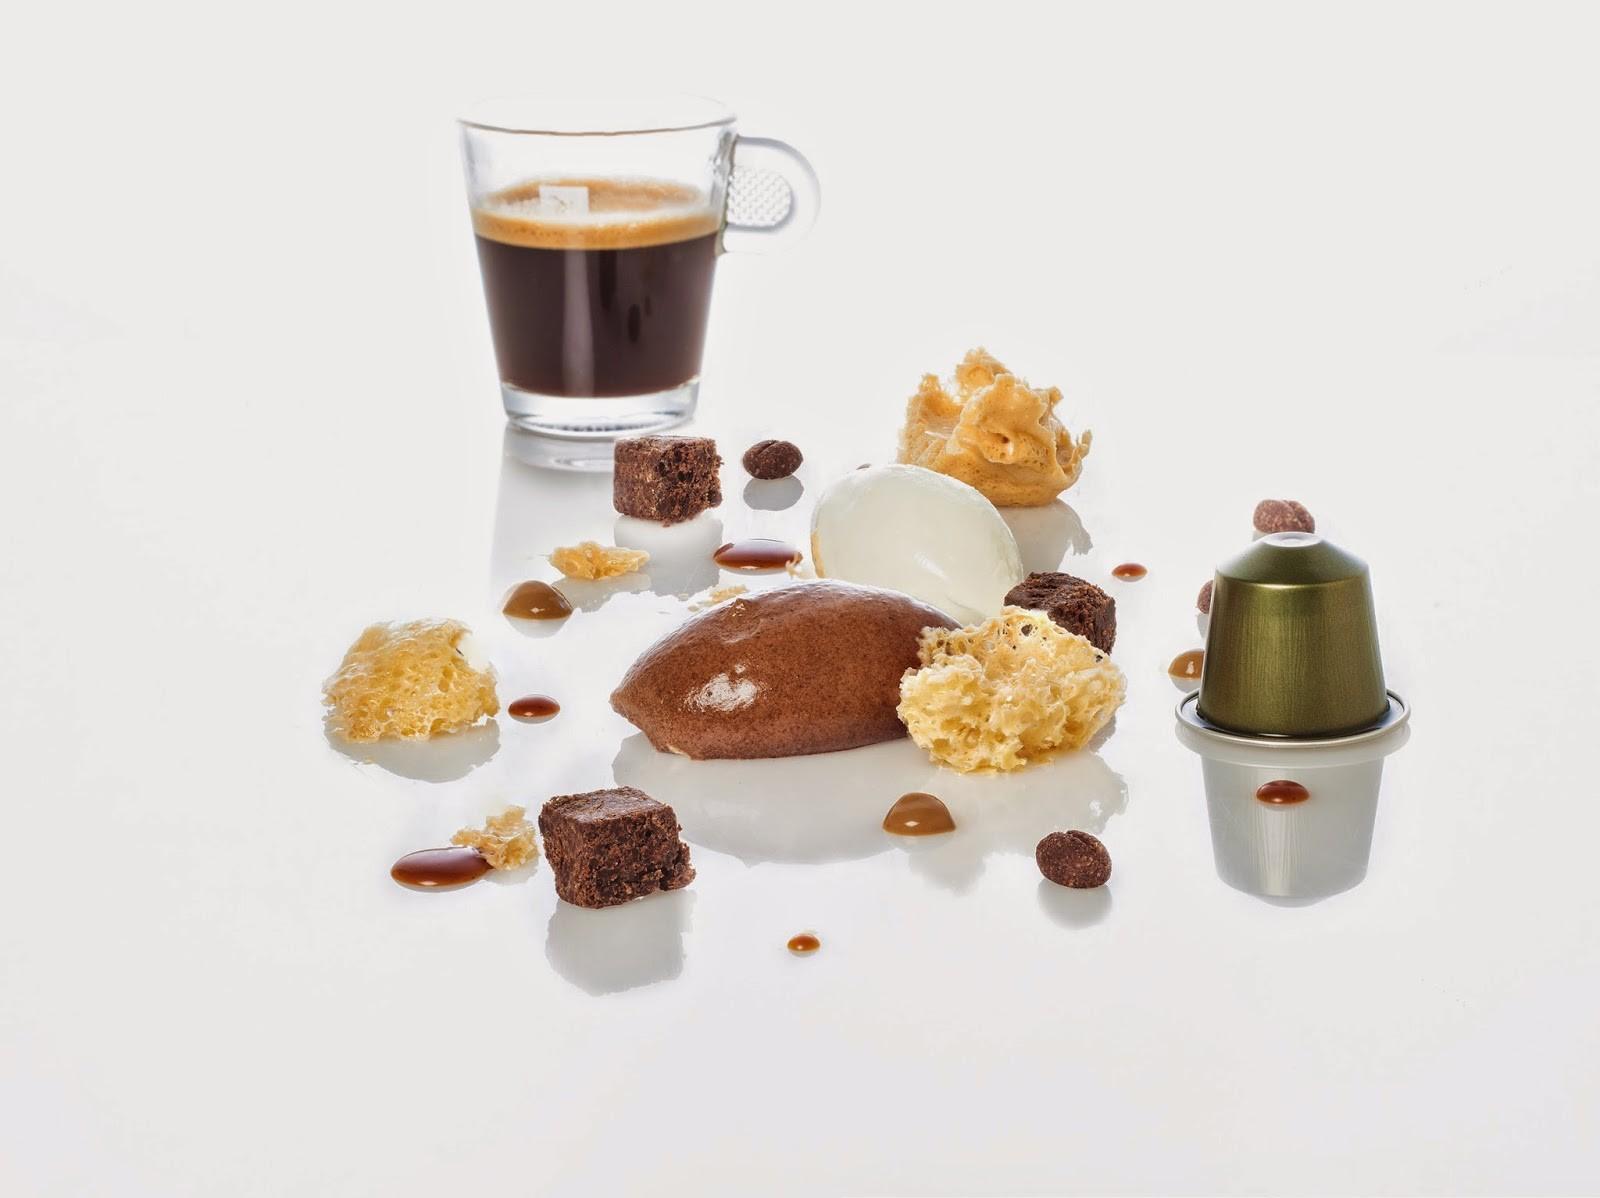 NespressoGourmetWeeks_PacoRoncero_Leche y café_01